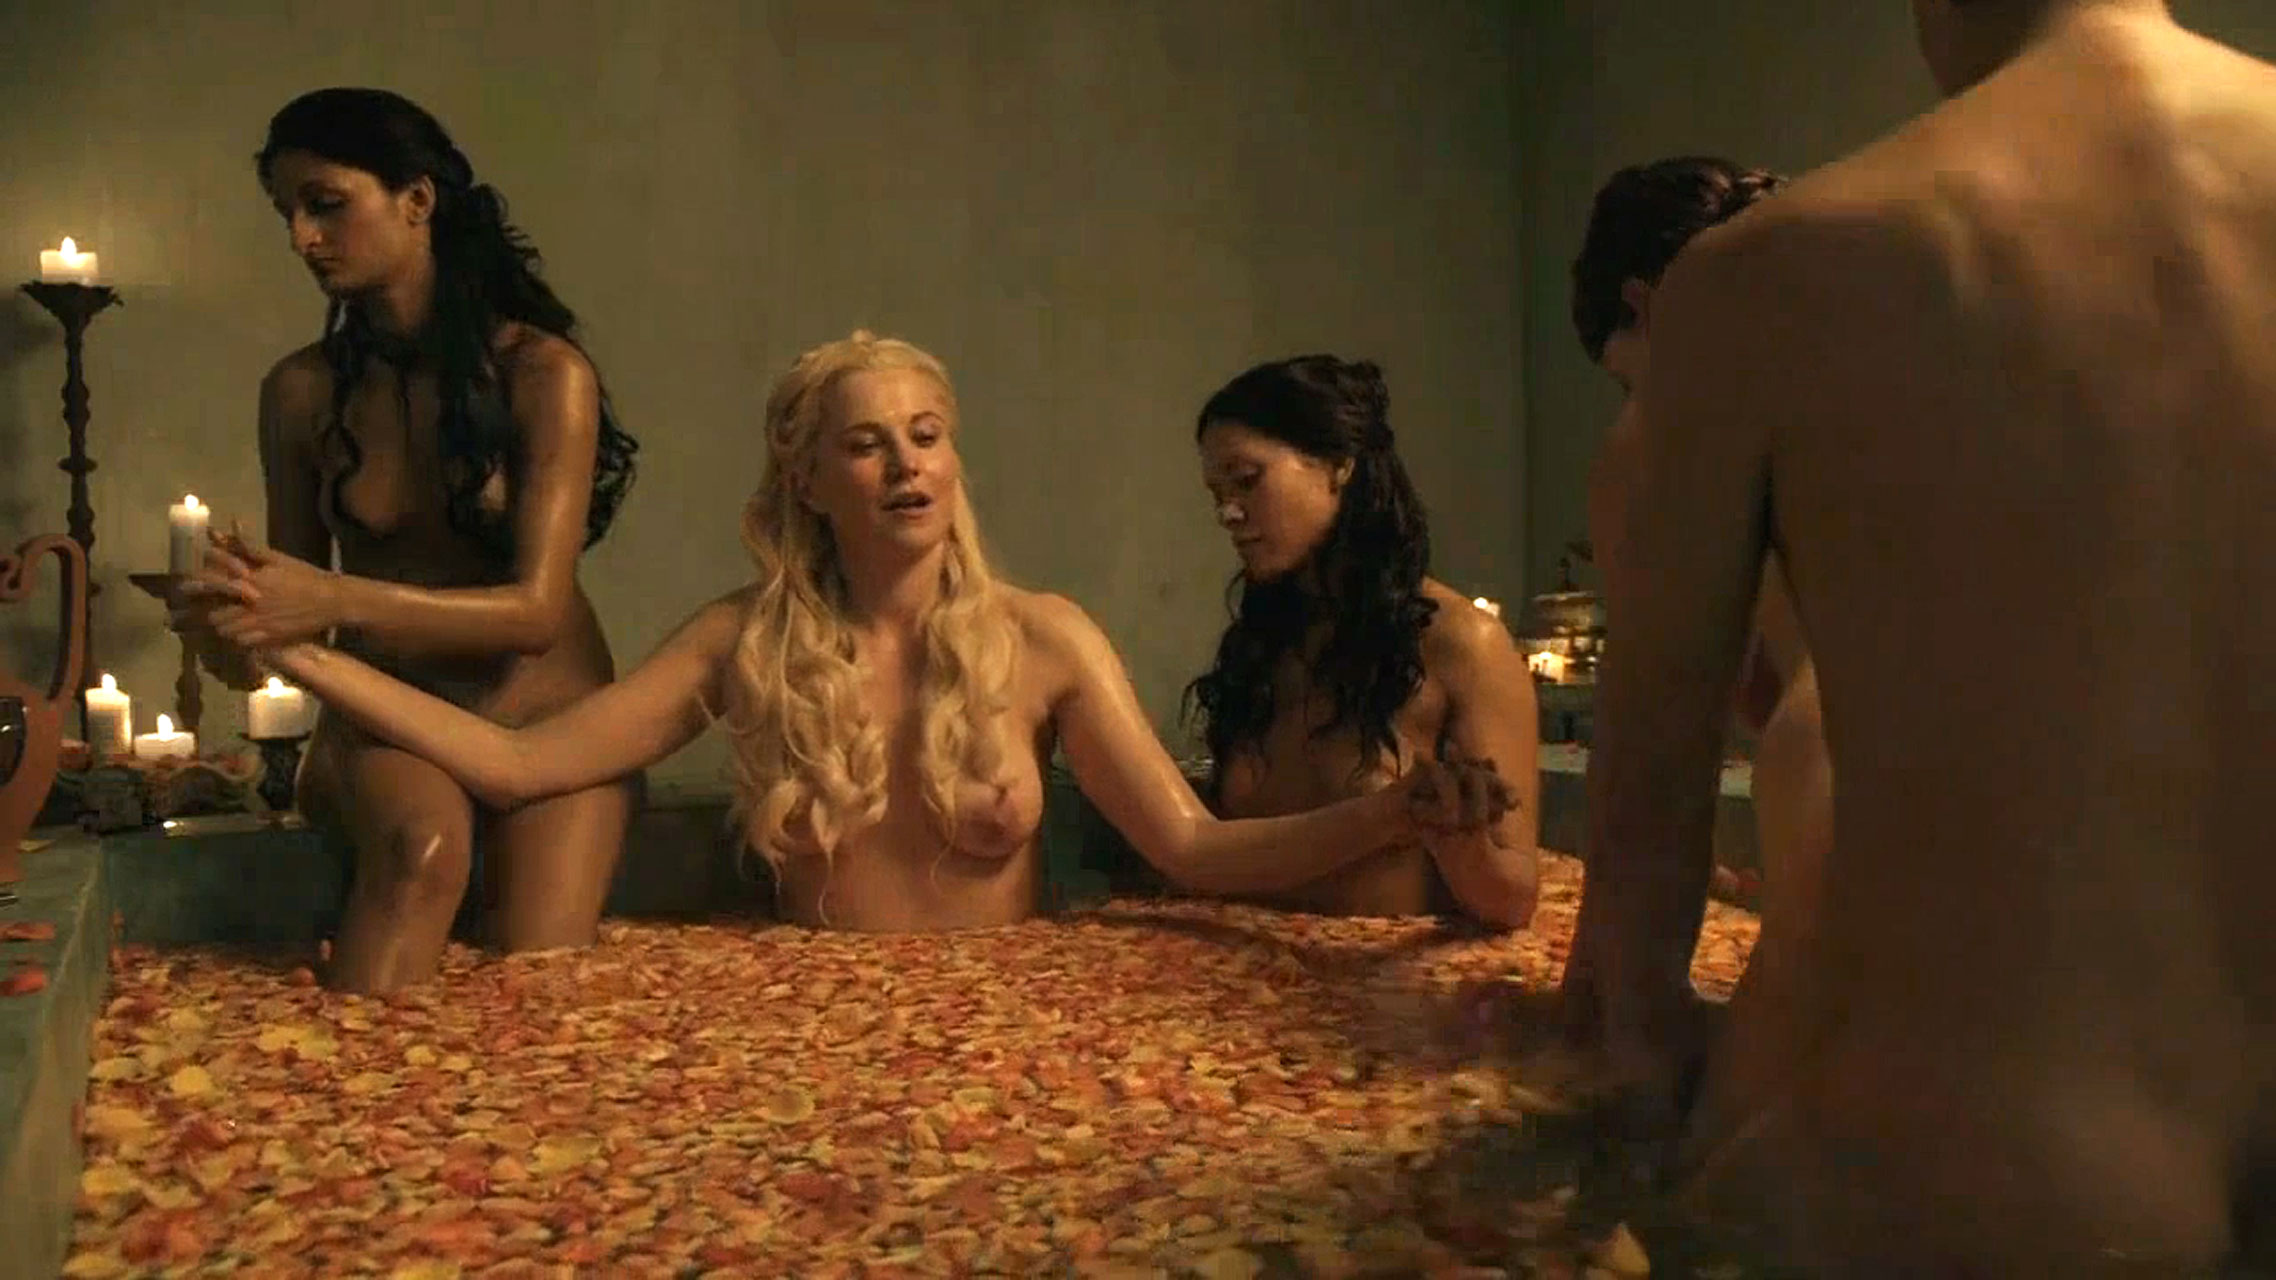 The movie xena legend porn 3gp hentai lesbian pornstars